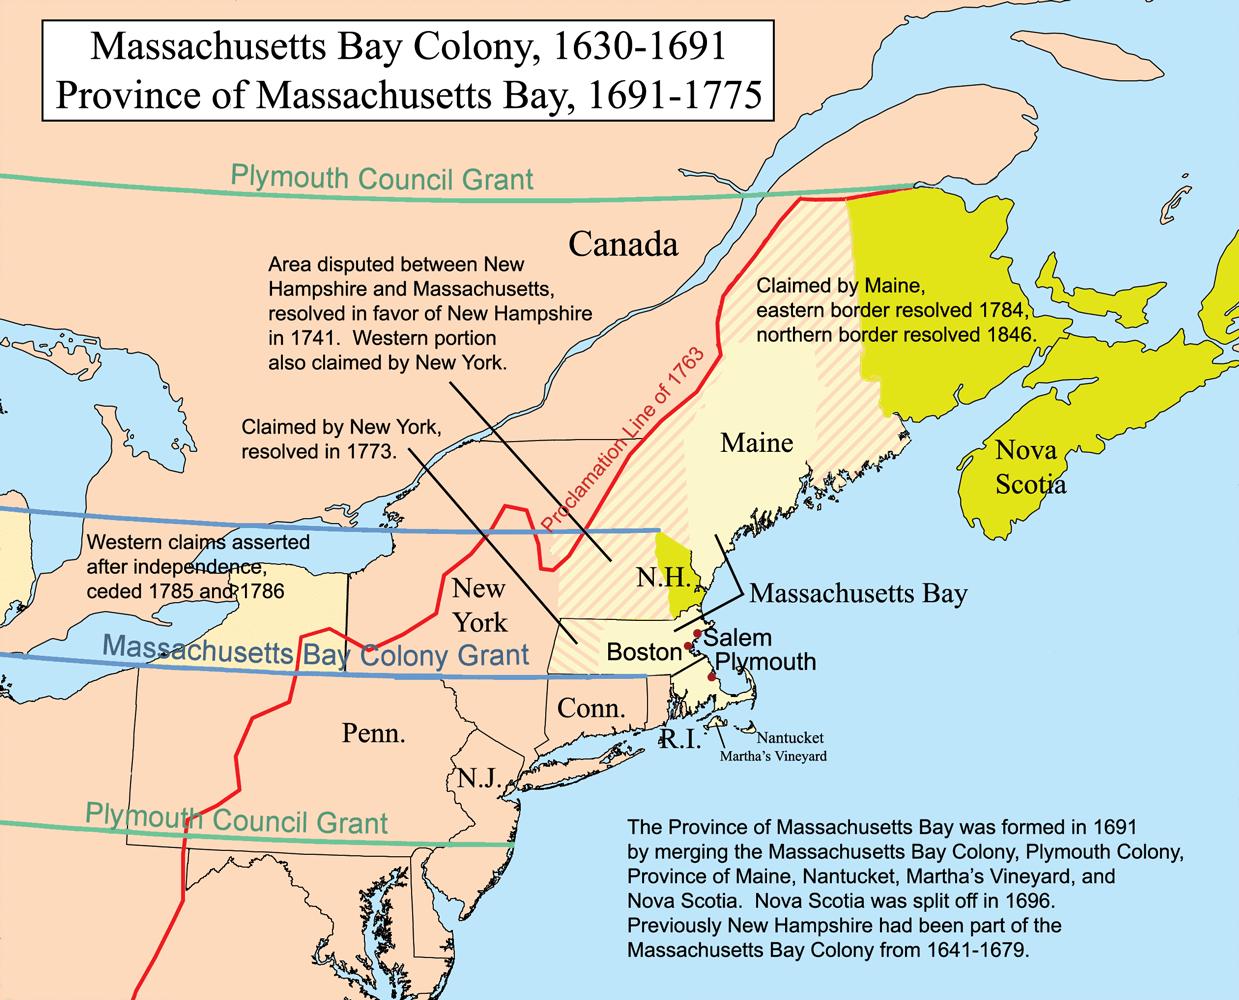 pilgrims vs puritans venn diagram xlr y connector new england colonies wikipedia